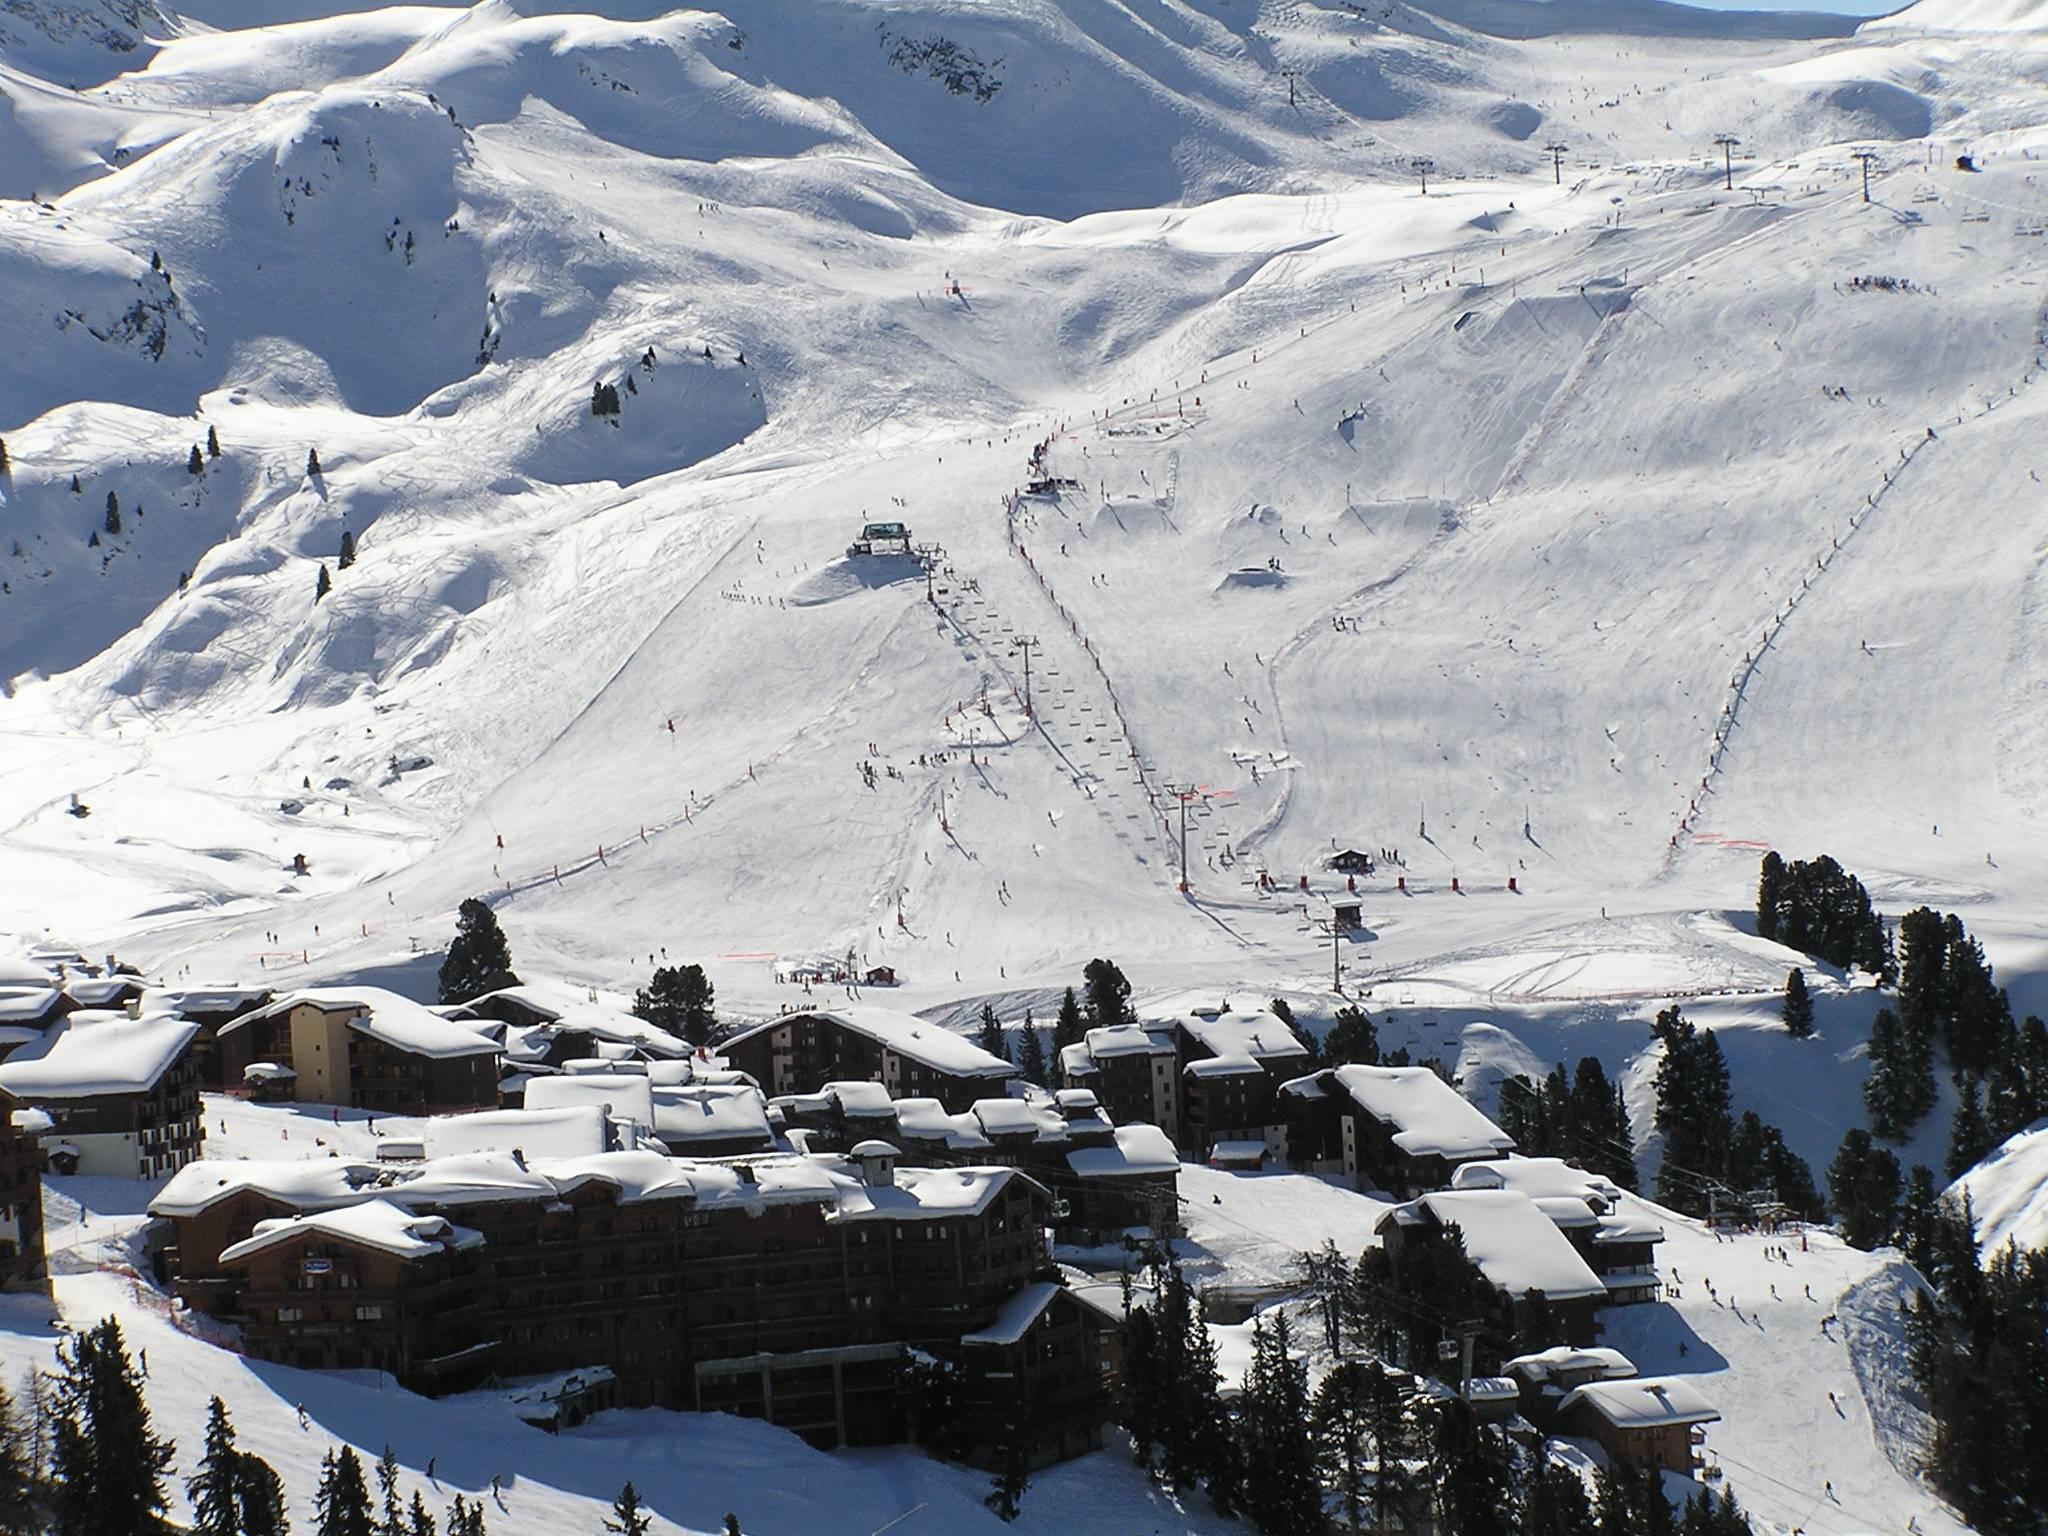 La Plagne - Station de ski